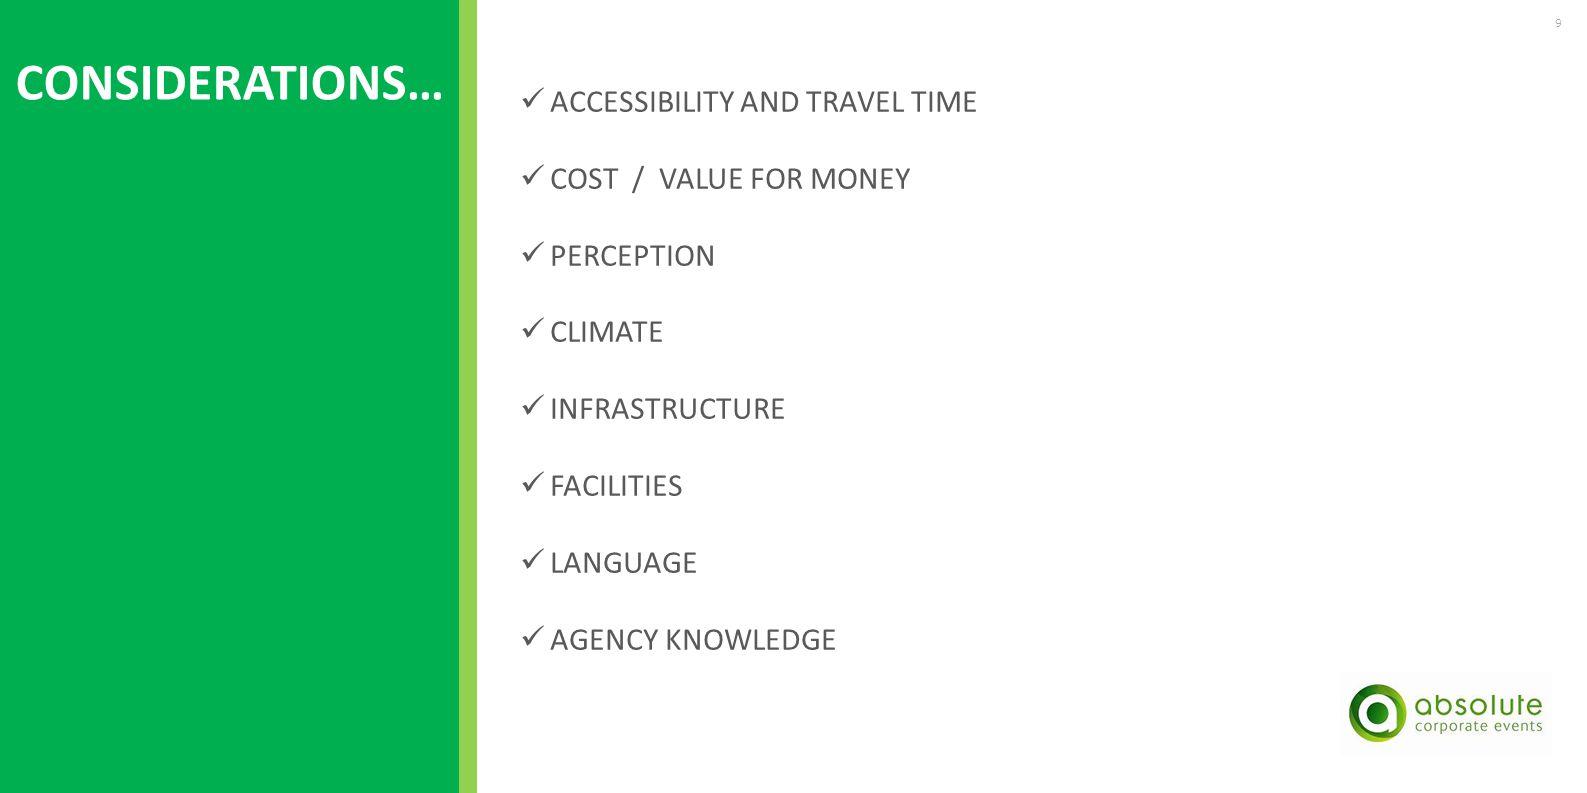 Criteria for Destination Selection – Agency